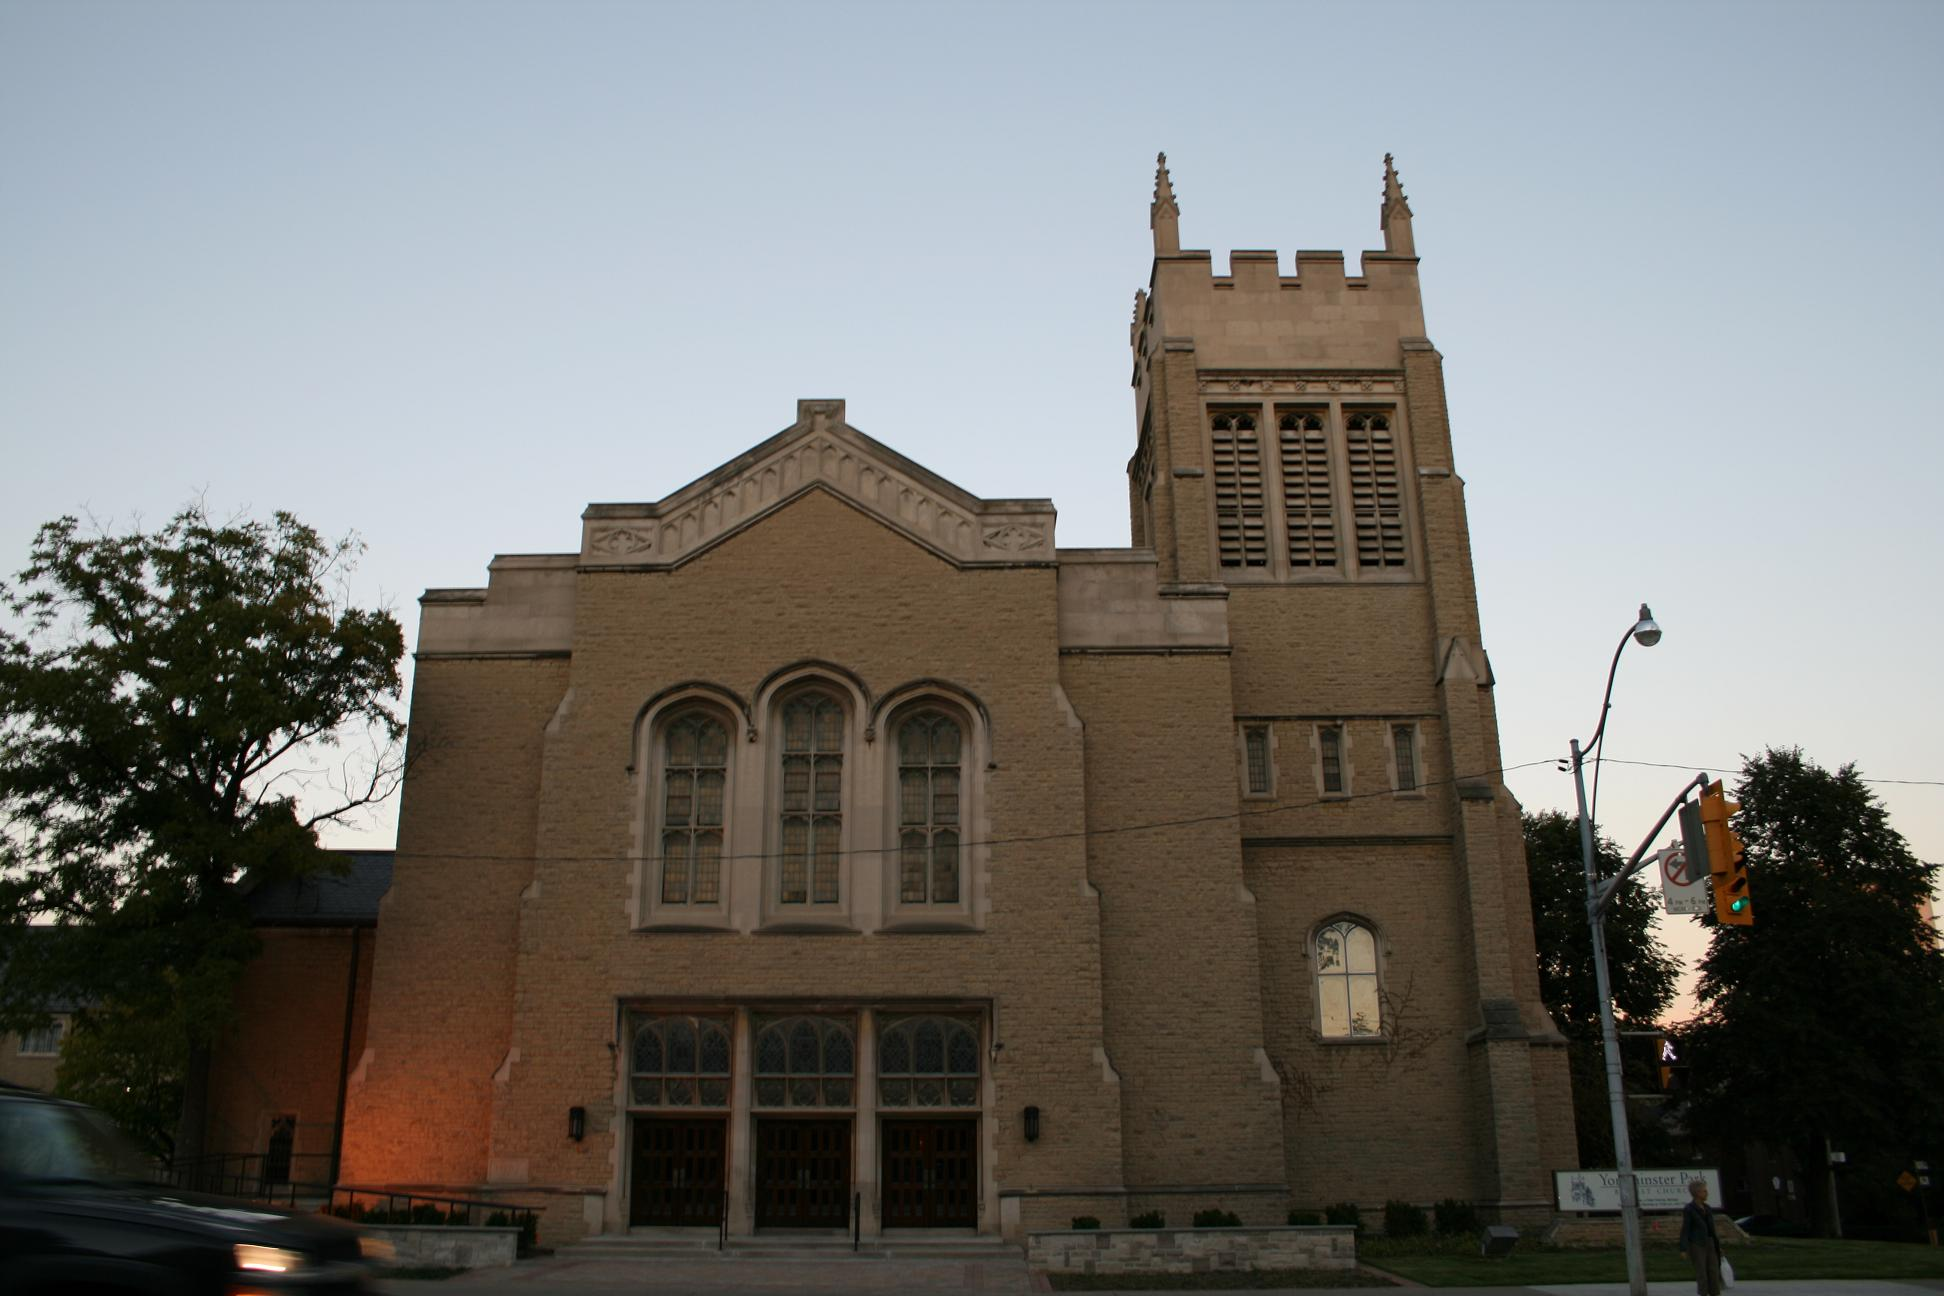 Yorkminster Park Baptist Church (Toronto) - Wikipedia